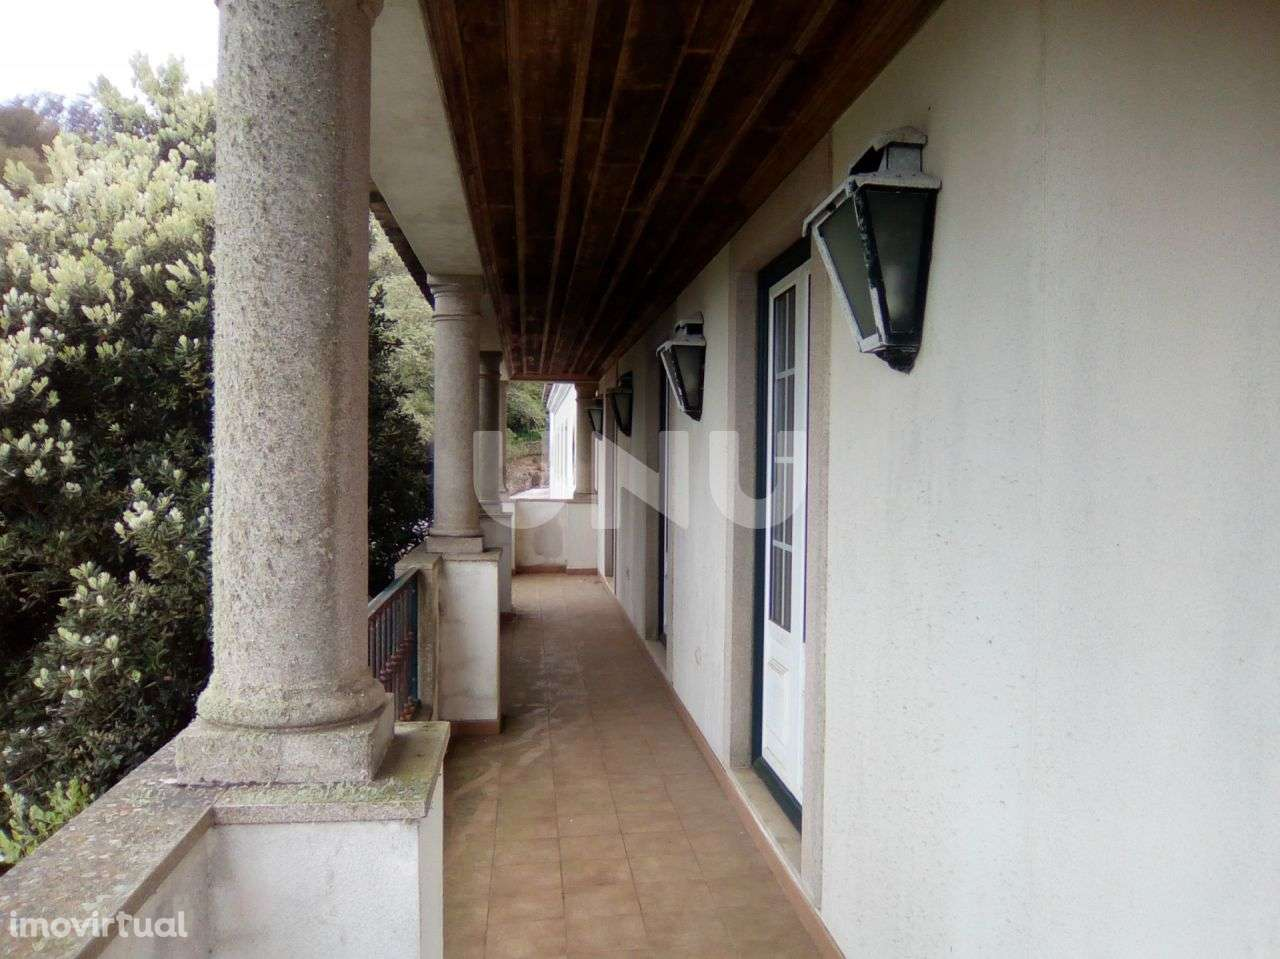 Quintas e herdades para comprar, Colares, Sintra, Lisboa - Foto 13